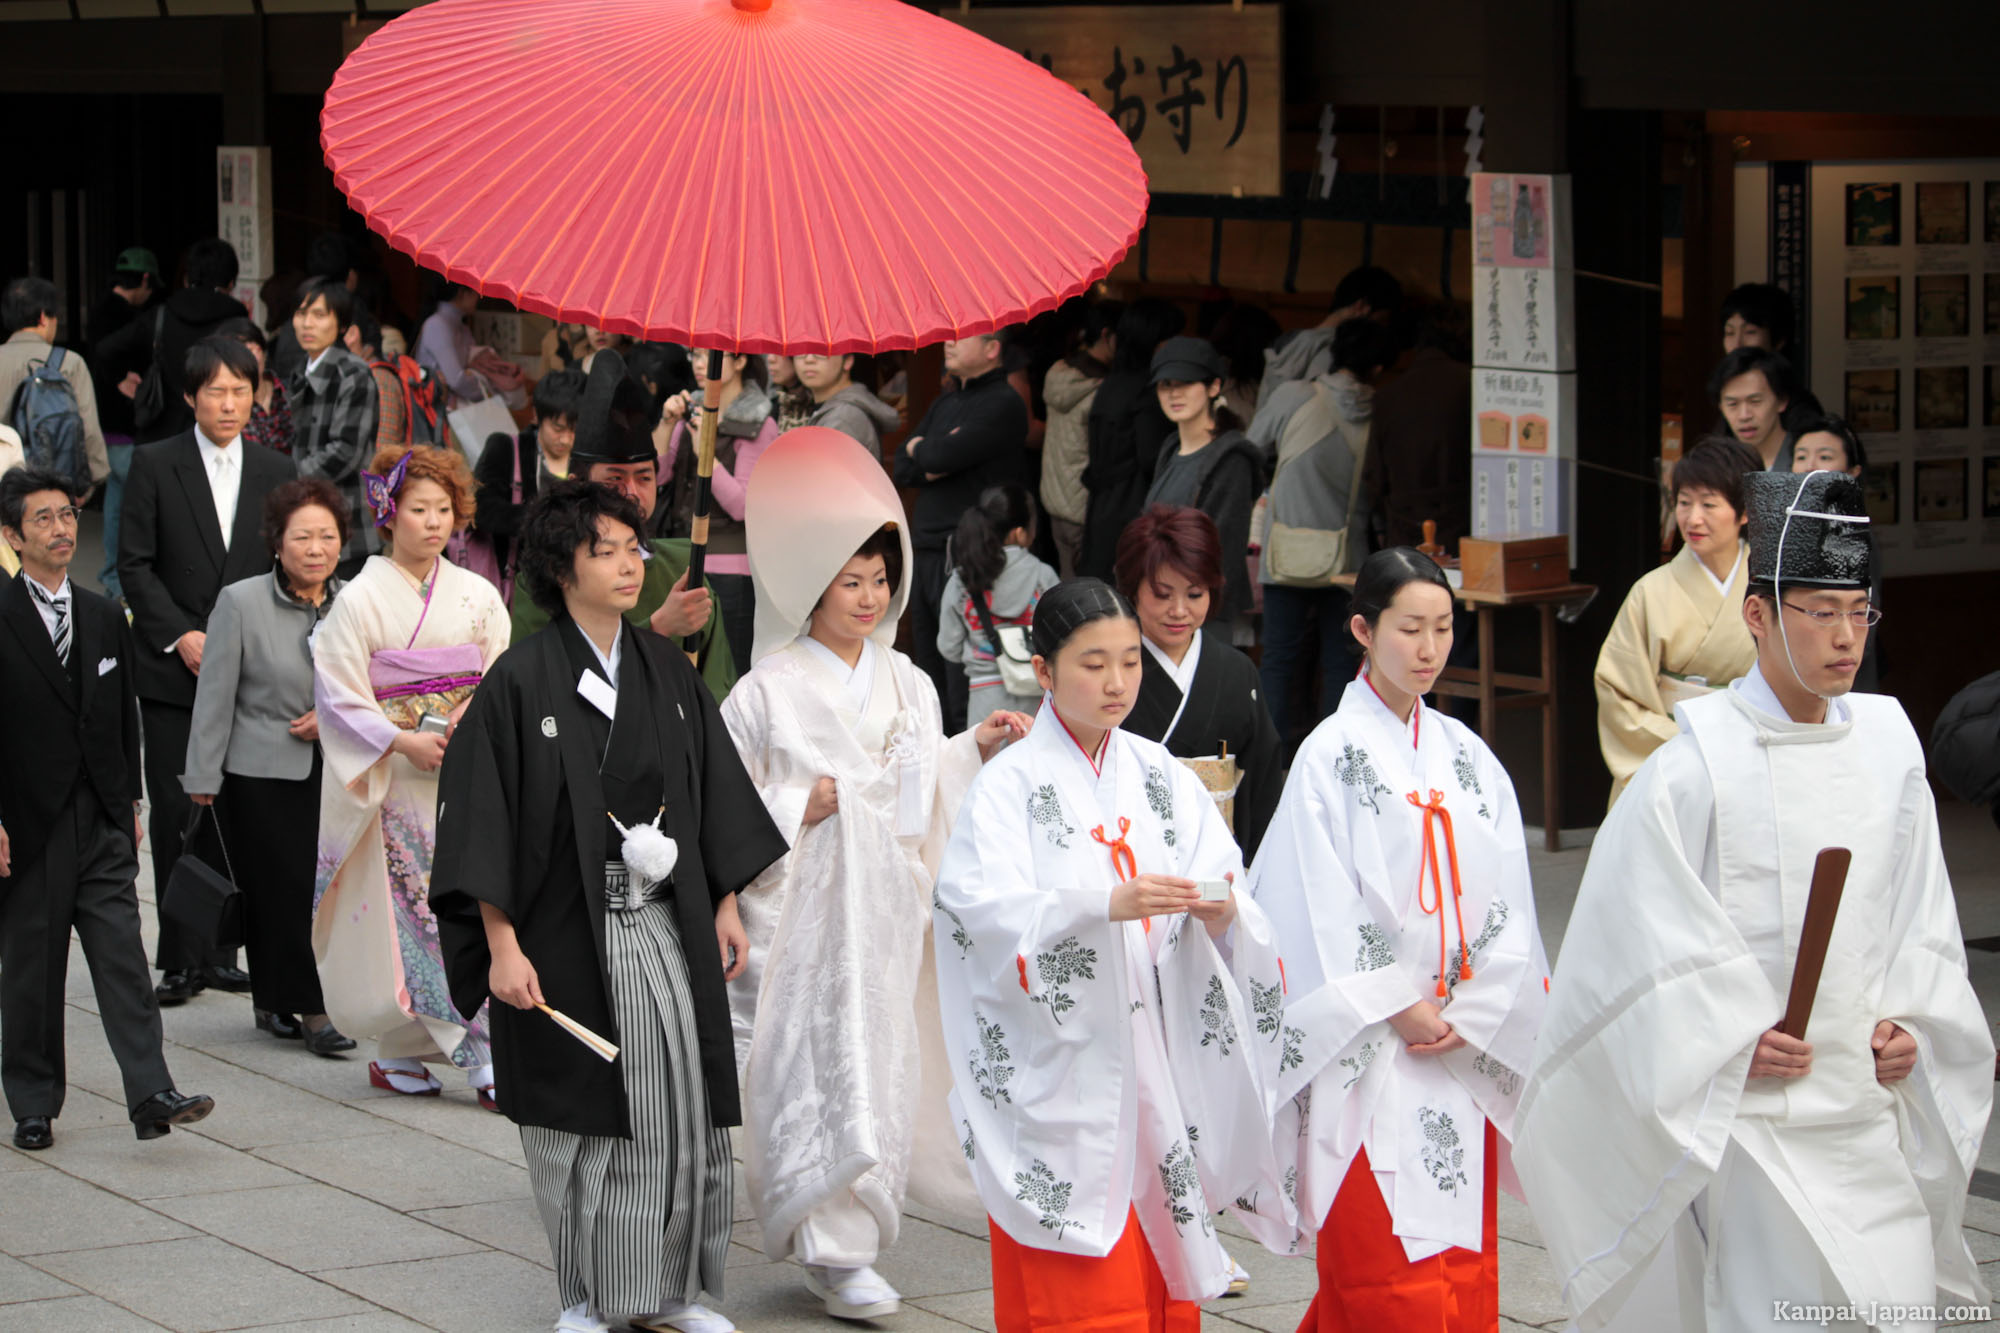 Matrimonio In Giappone : Matrimonio in giappone tradurre il